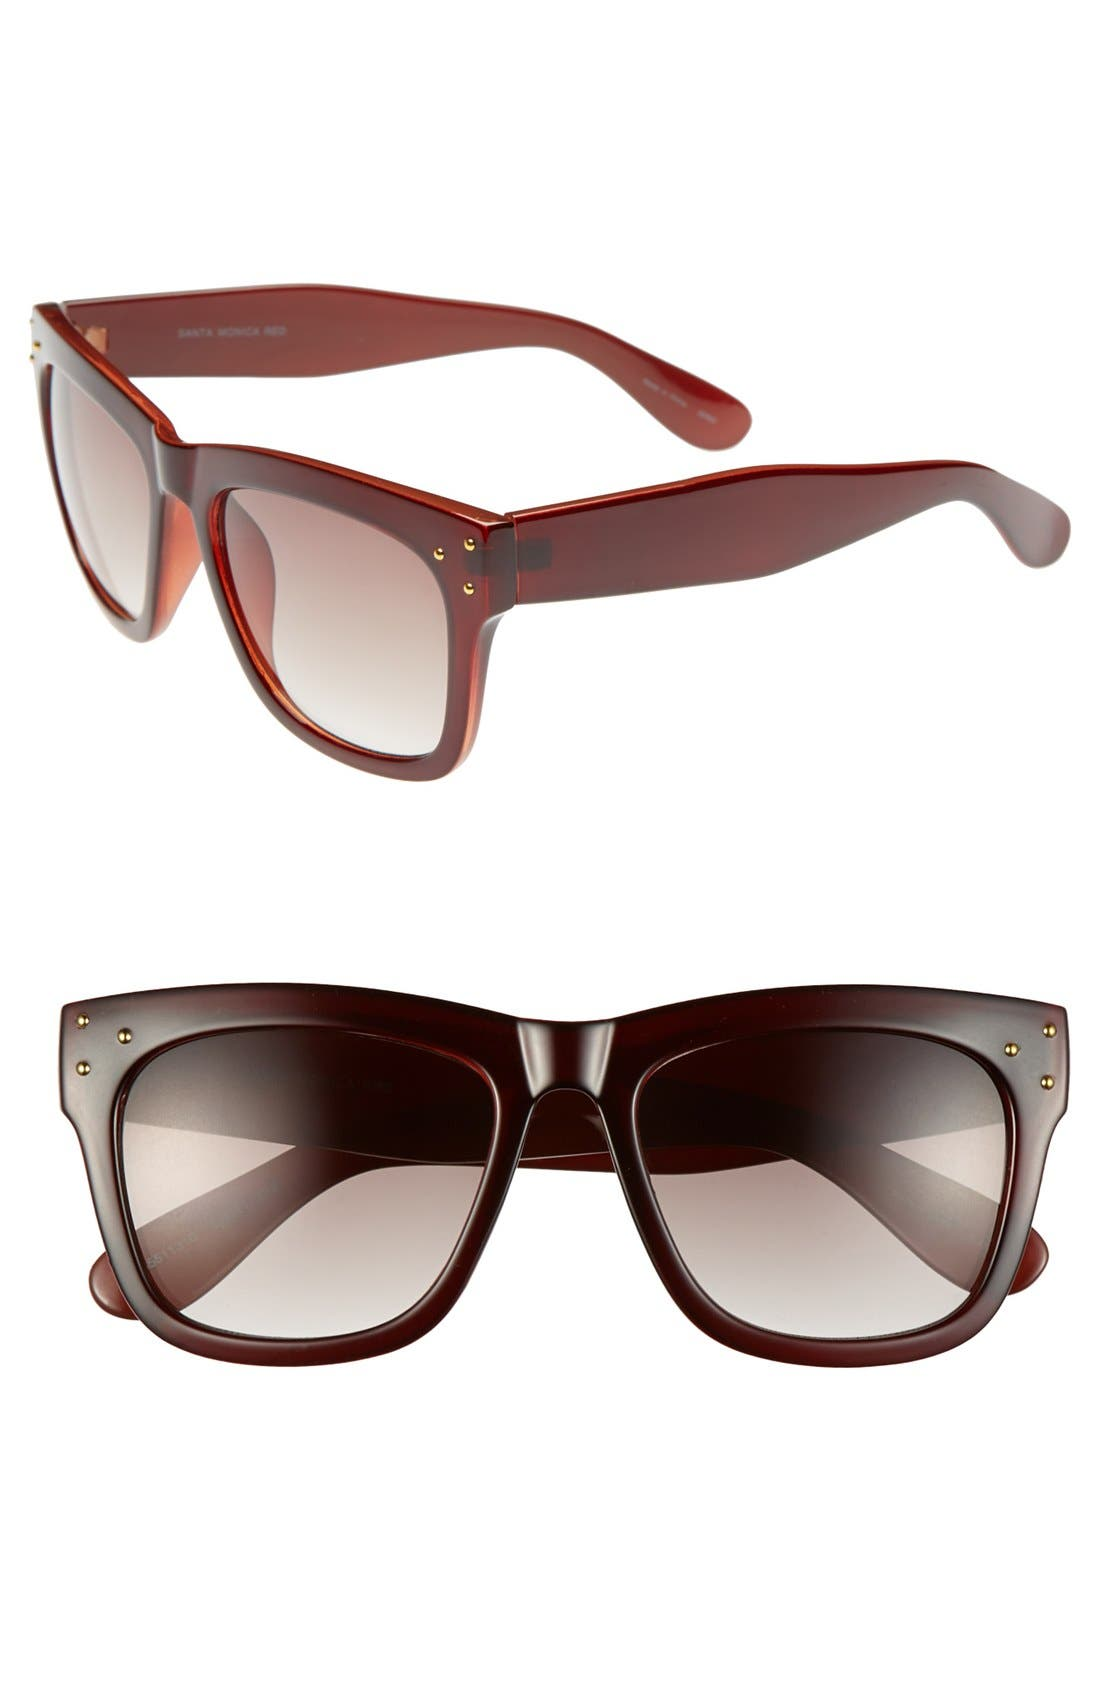 Main Image - Outlook Eyewear 'Santa Monica' 53mm Sunglasses